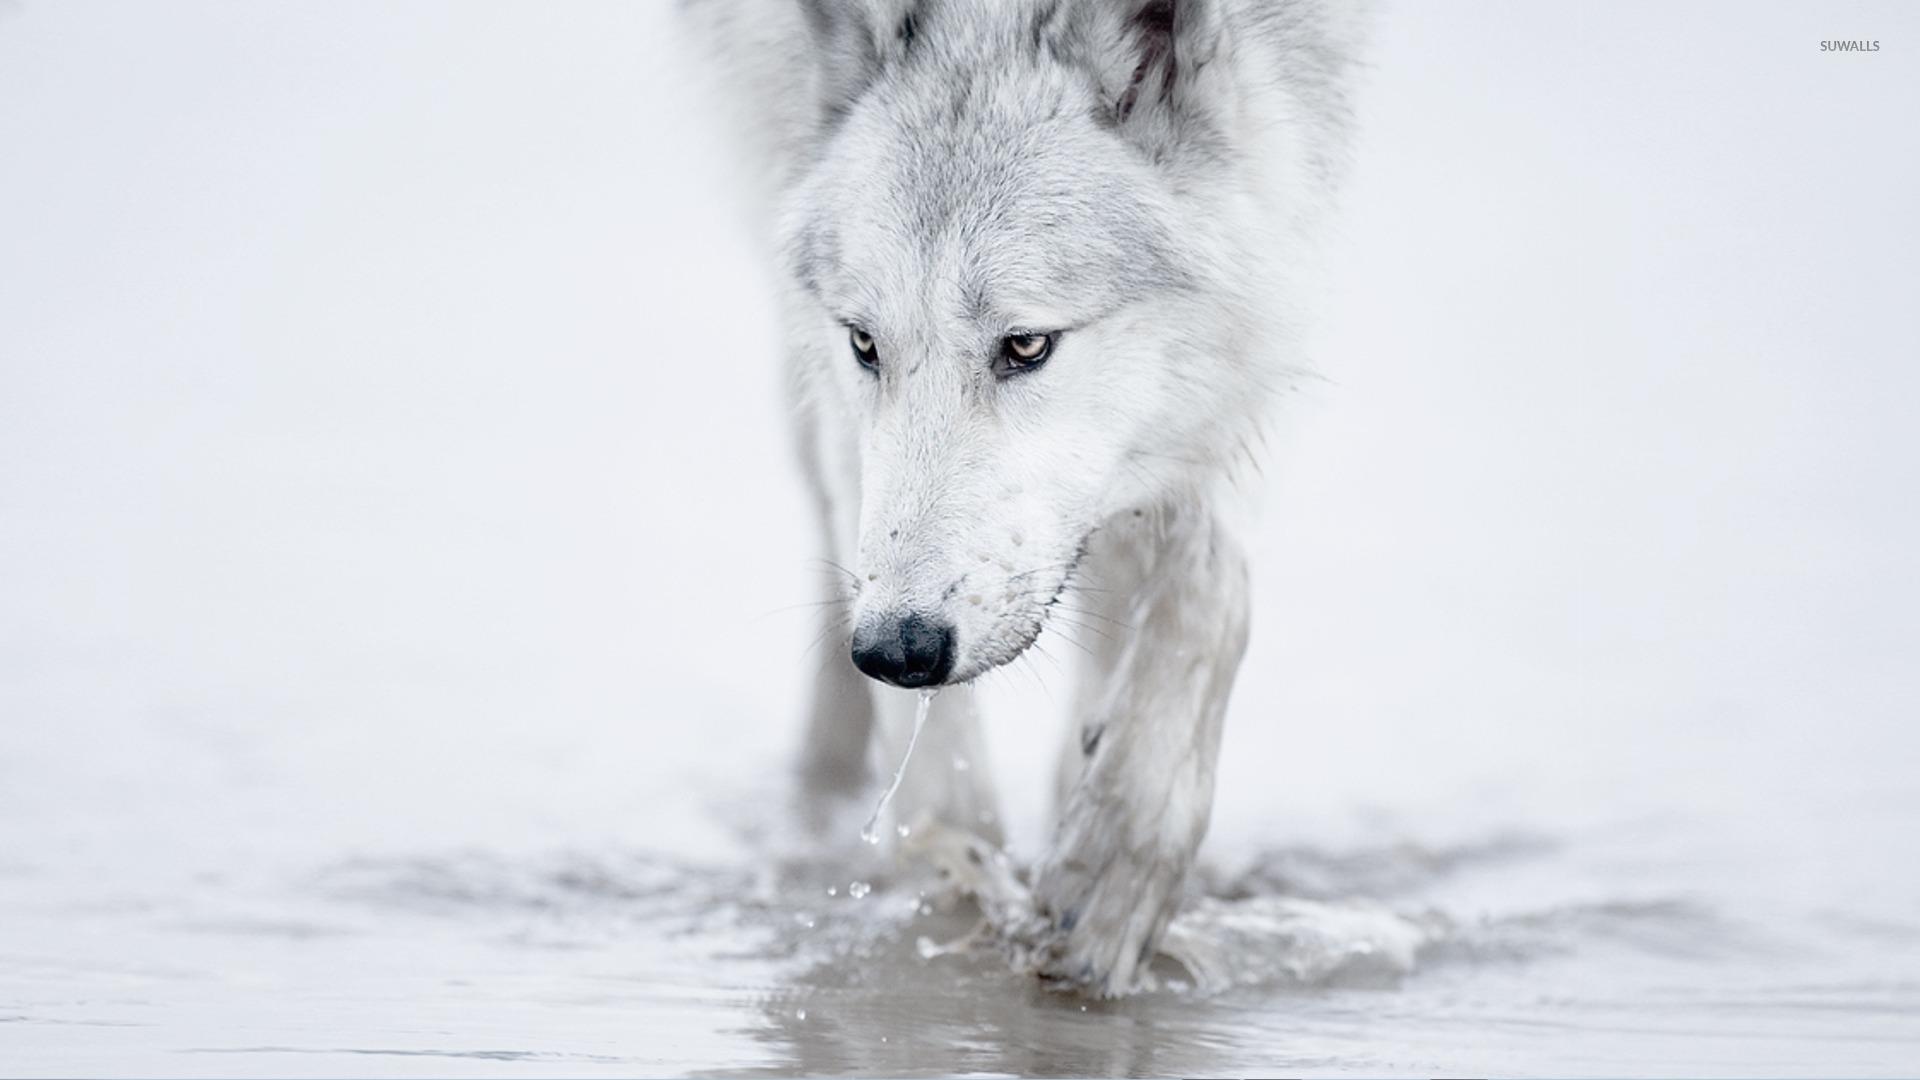 Обои волк на рабочий стол hd